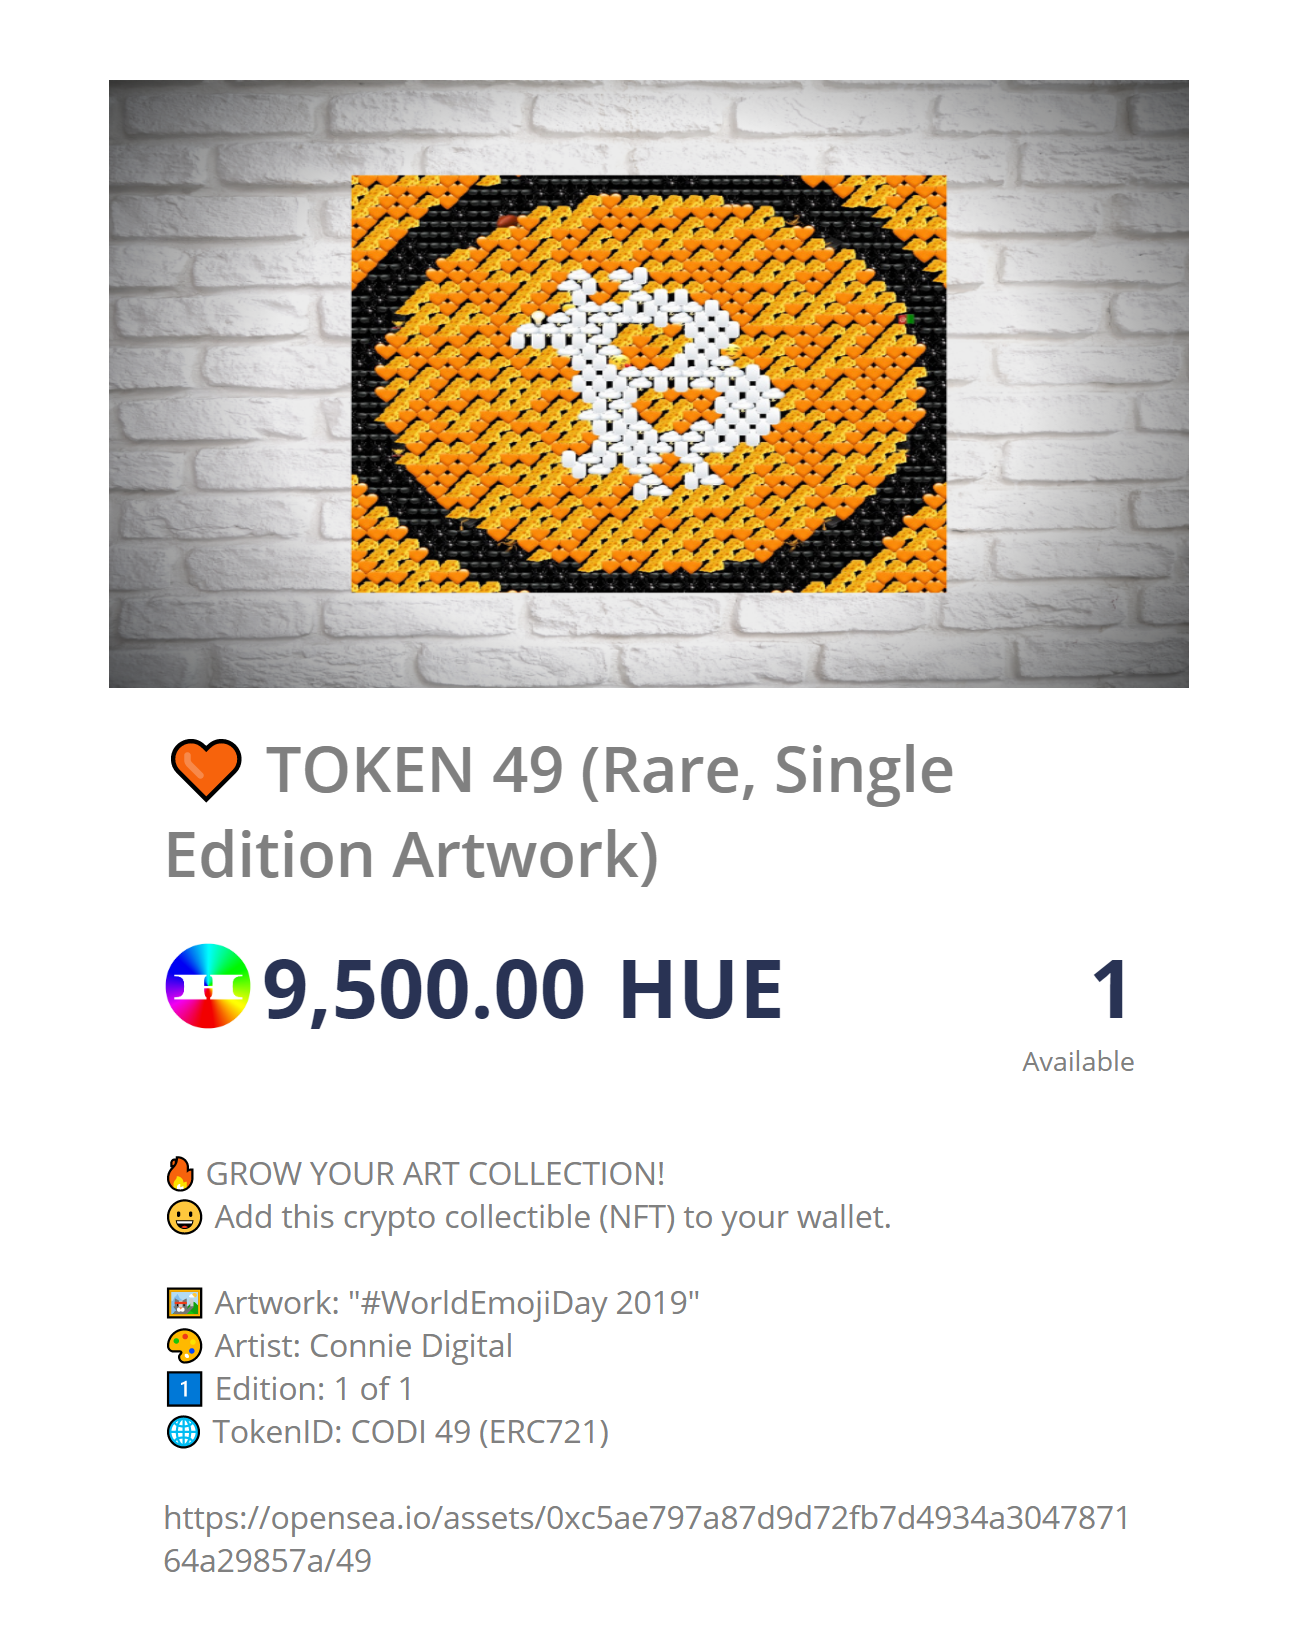 Connie Digital Bitcoin Artwork